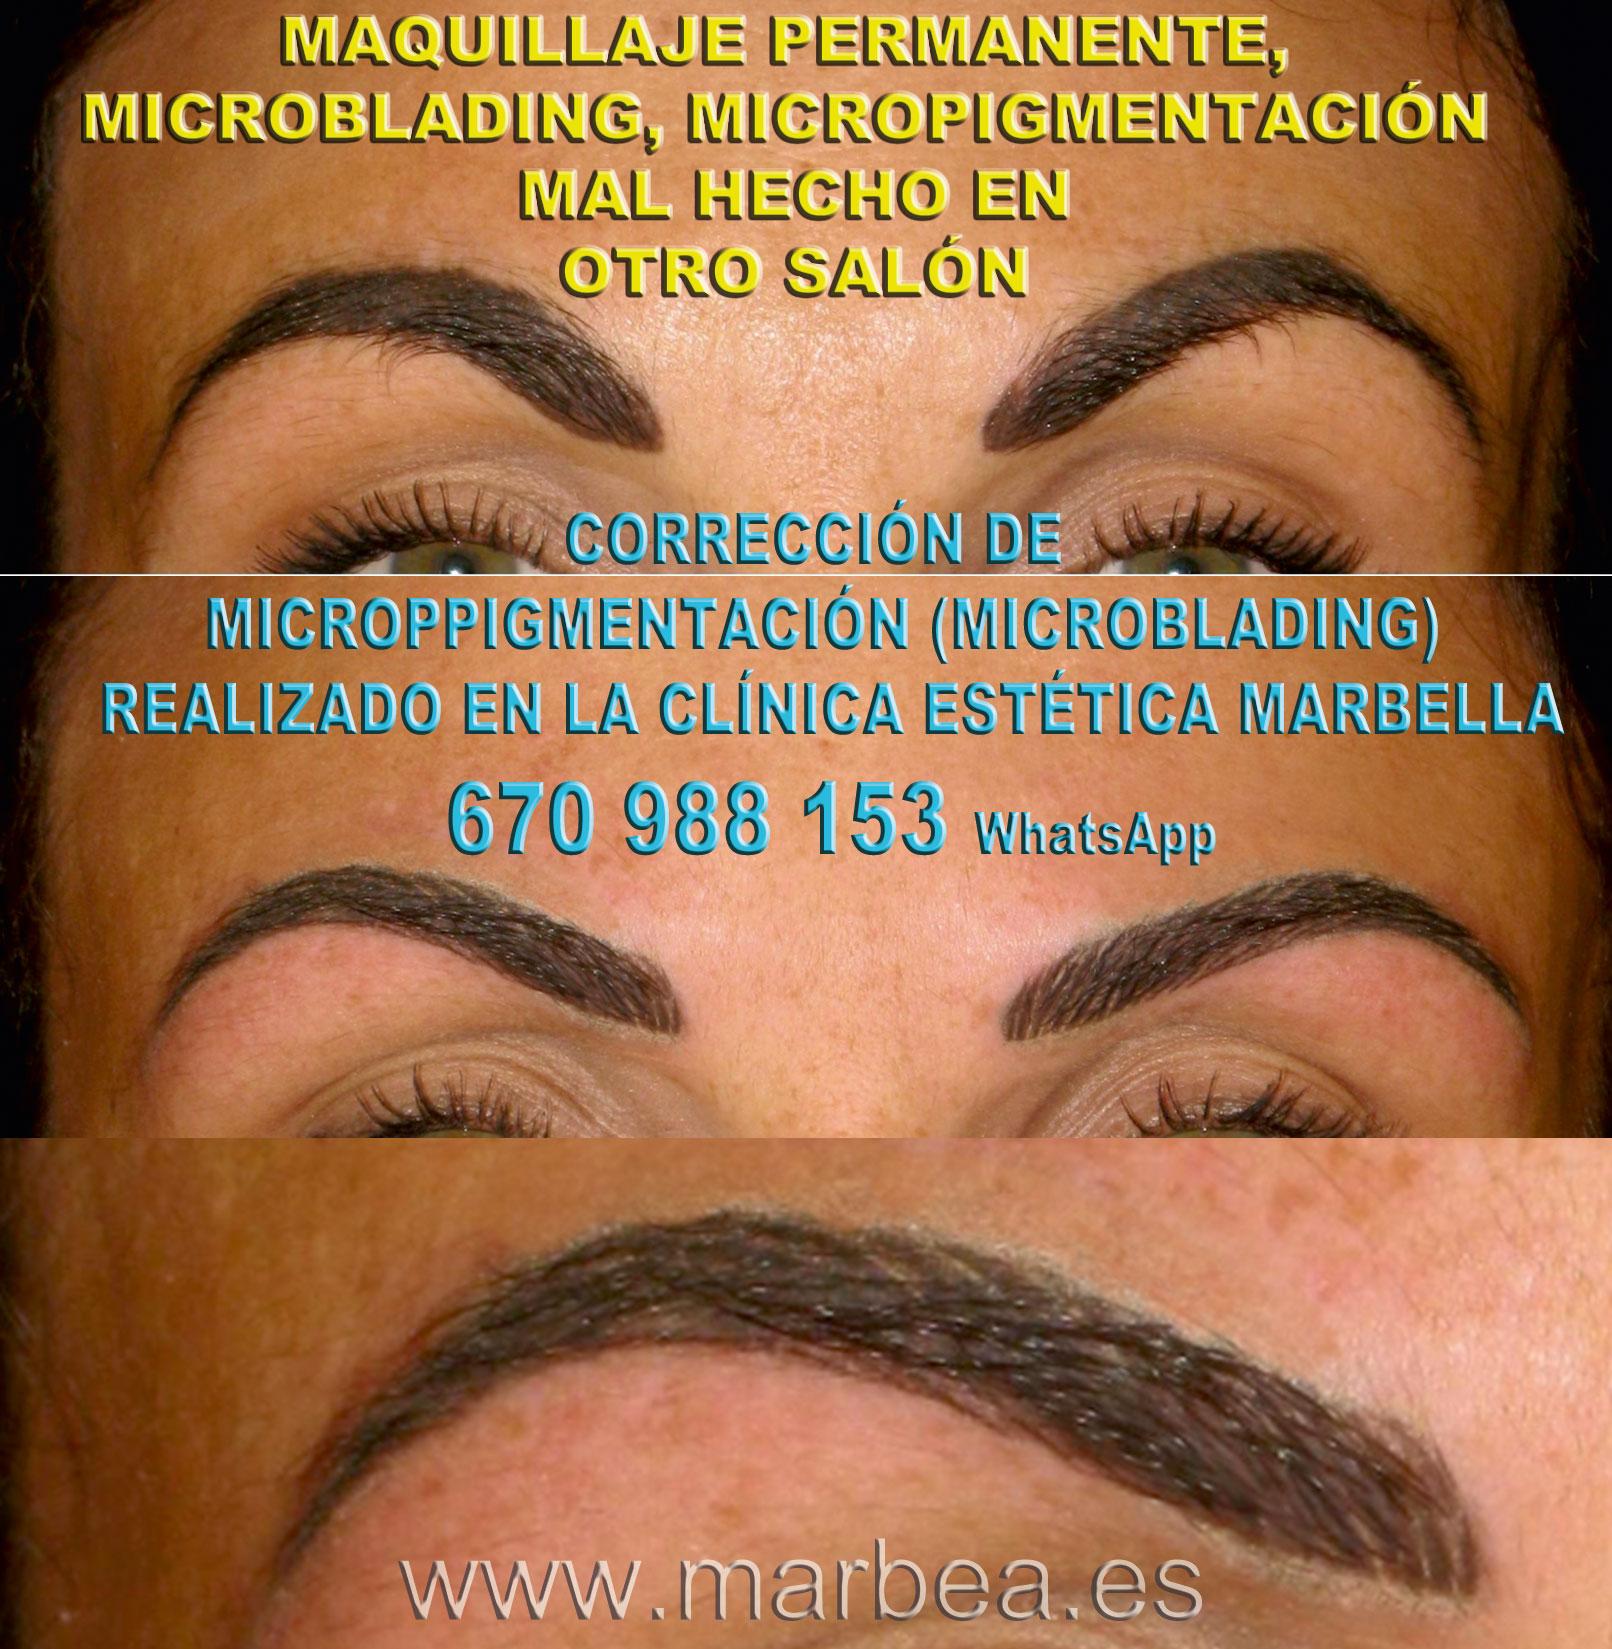 MAQUILLAJE PERMANENTE CEJAS MAL HECHO clínica estética tatuaje ofrece micropigmentacion correctiva de cejas,micropigmentación correctiva cejas mal hecha